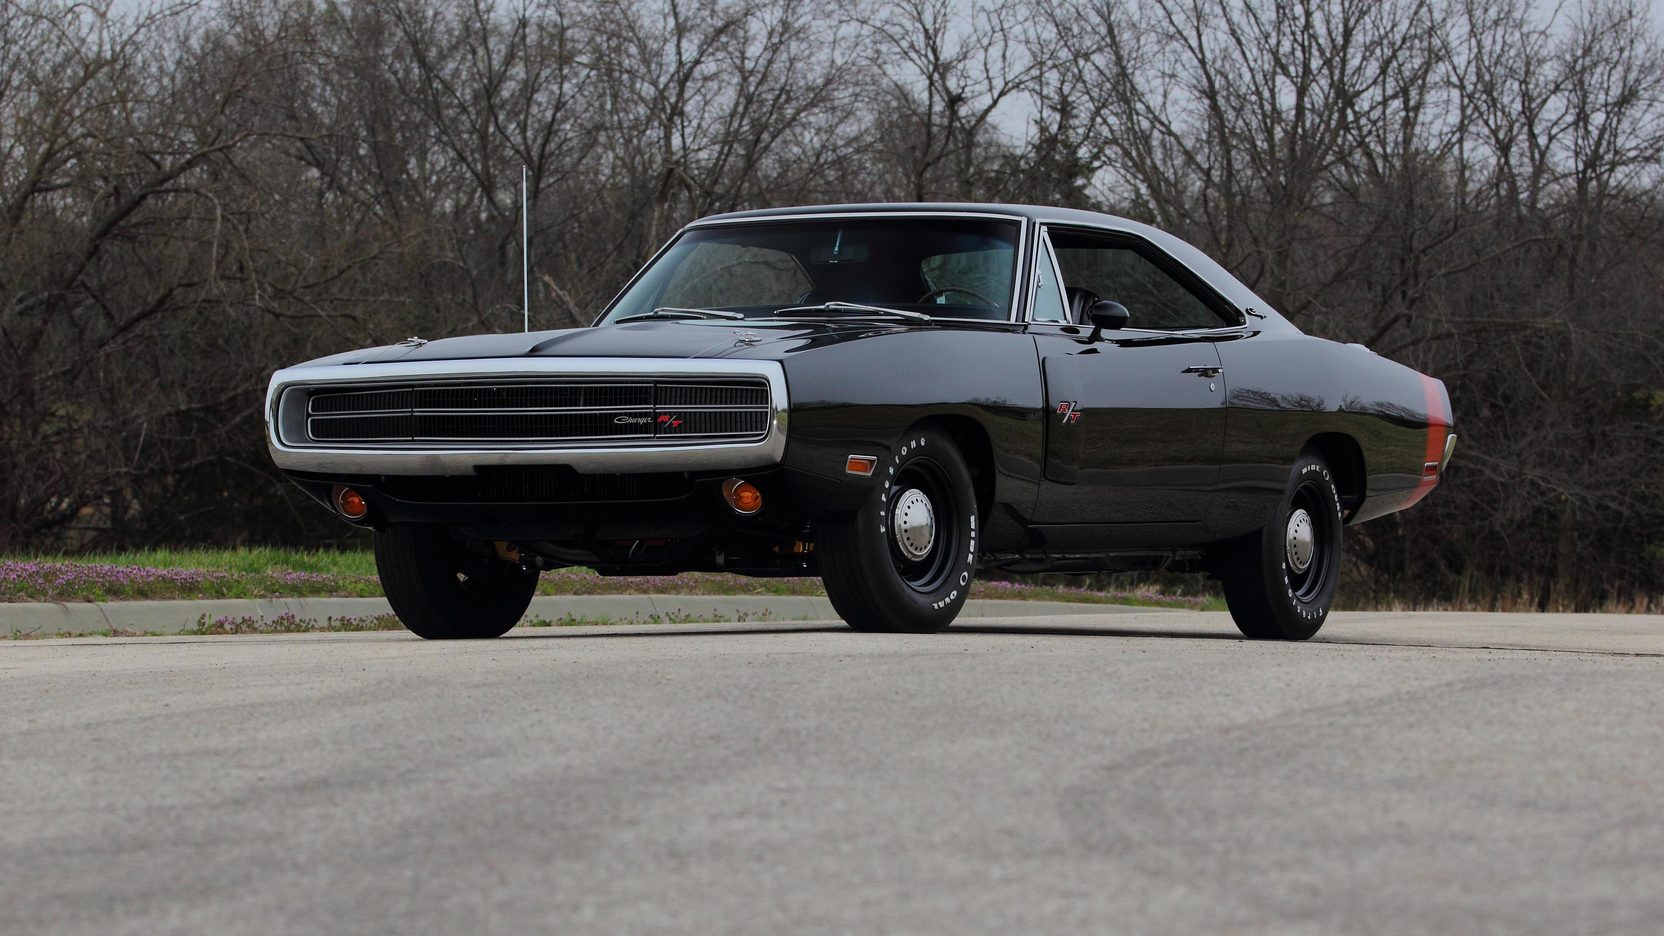 70 440 Six Dodge Pack Challenger Rt